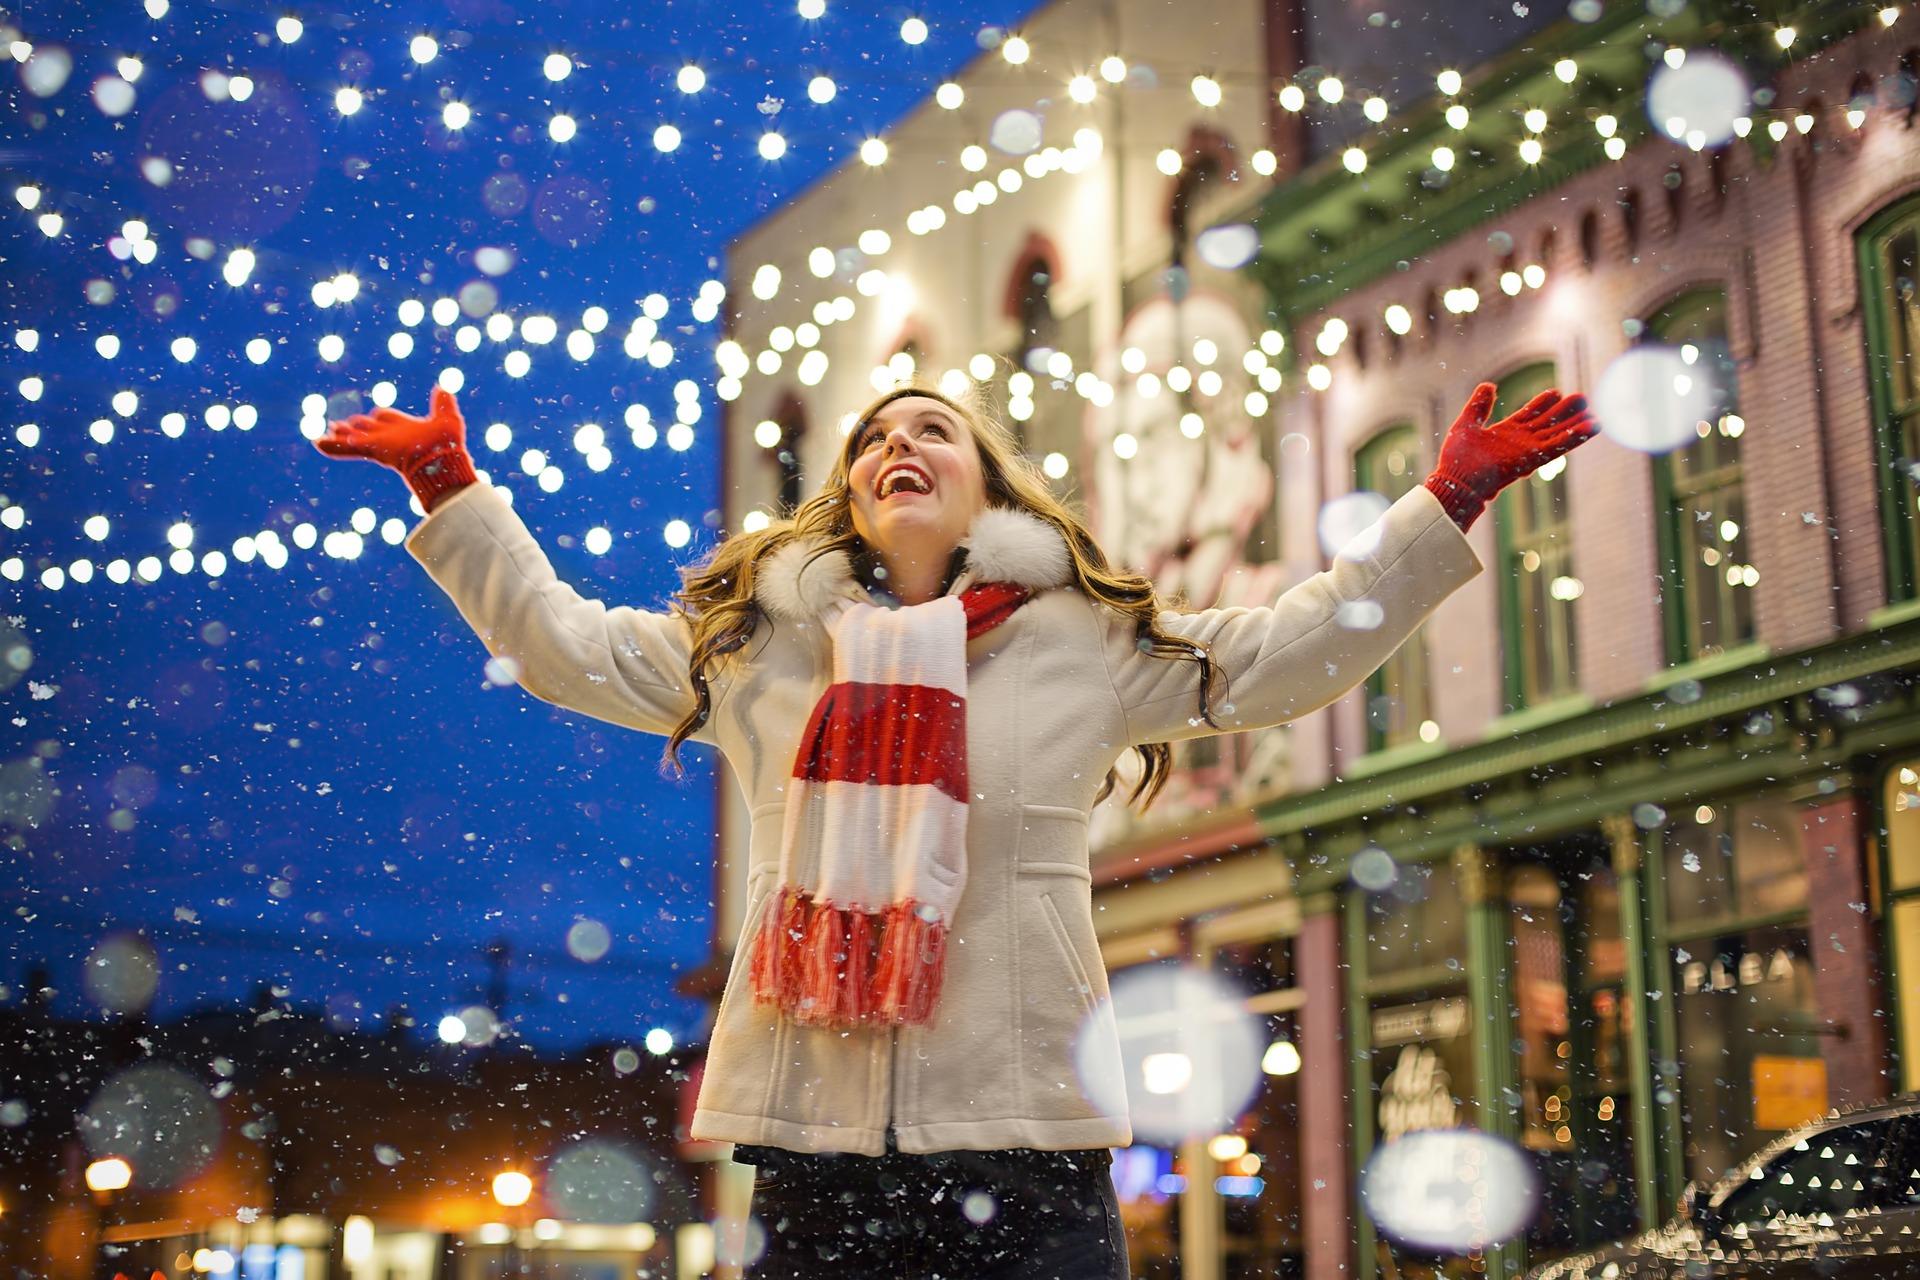 17 Ways to Reduce Holiday Stress